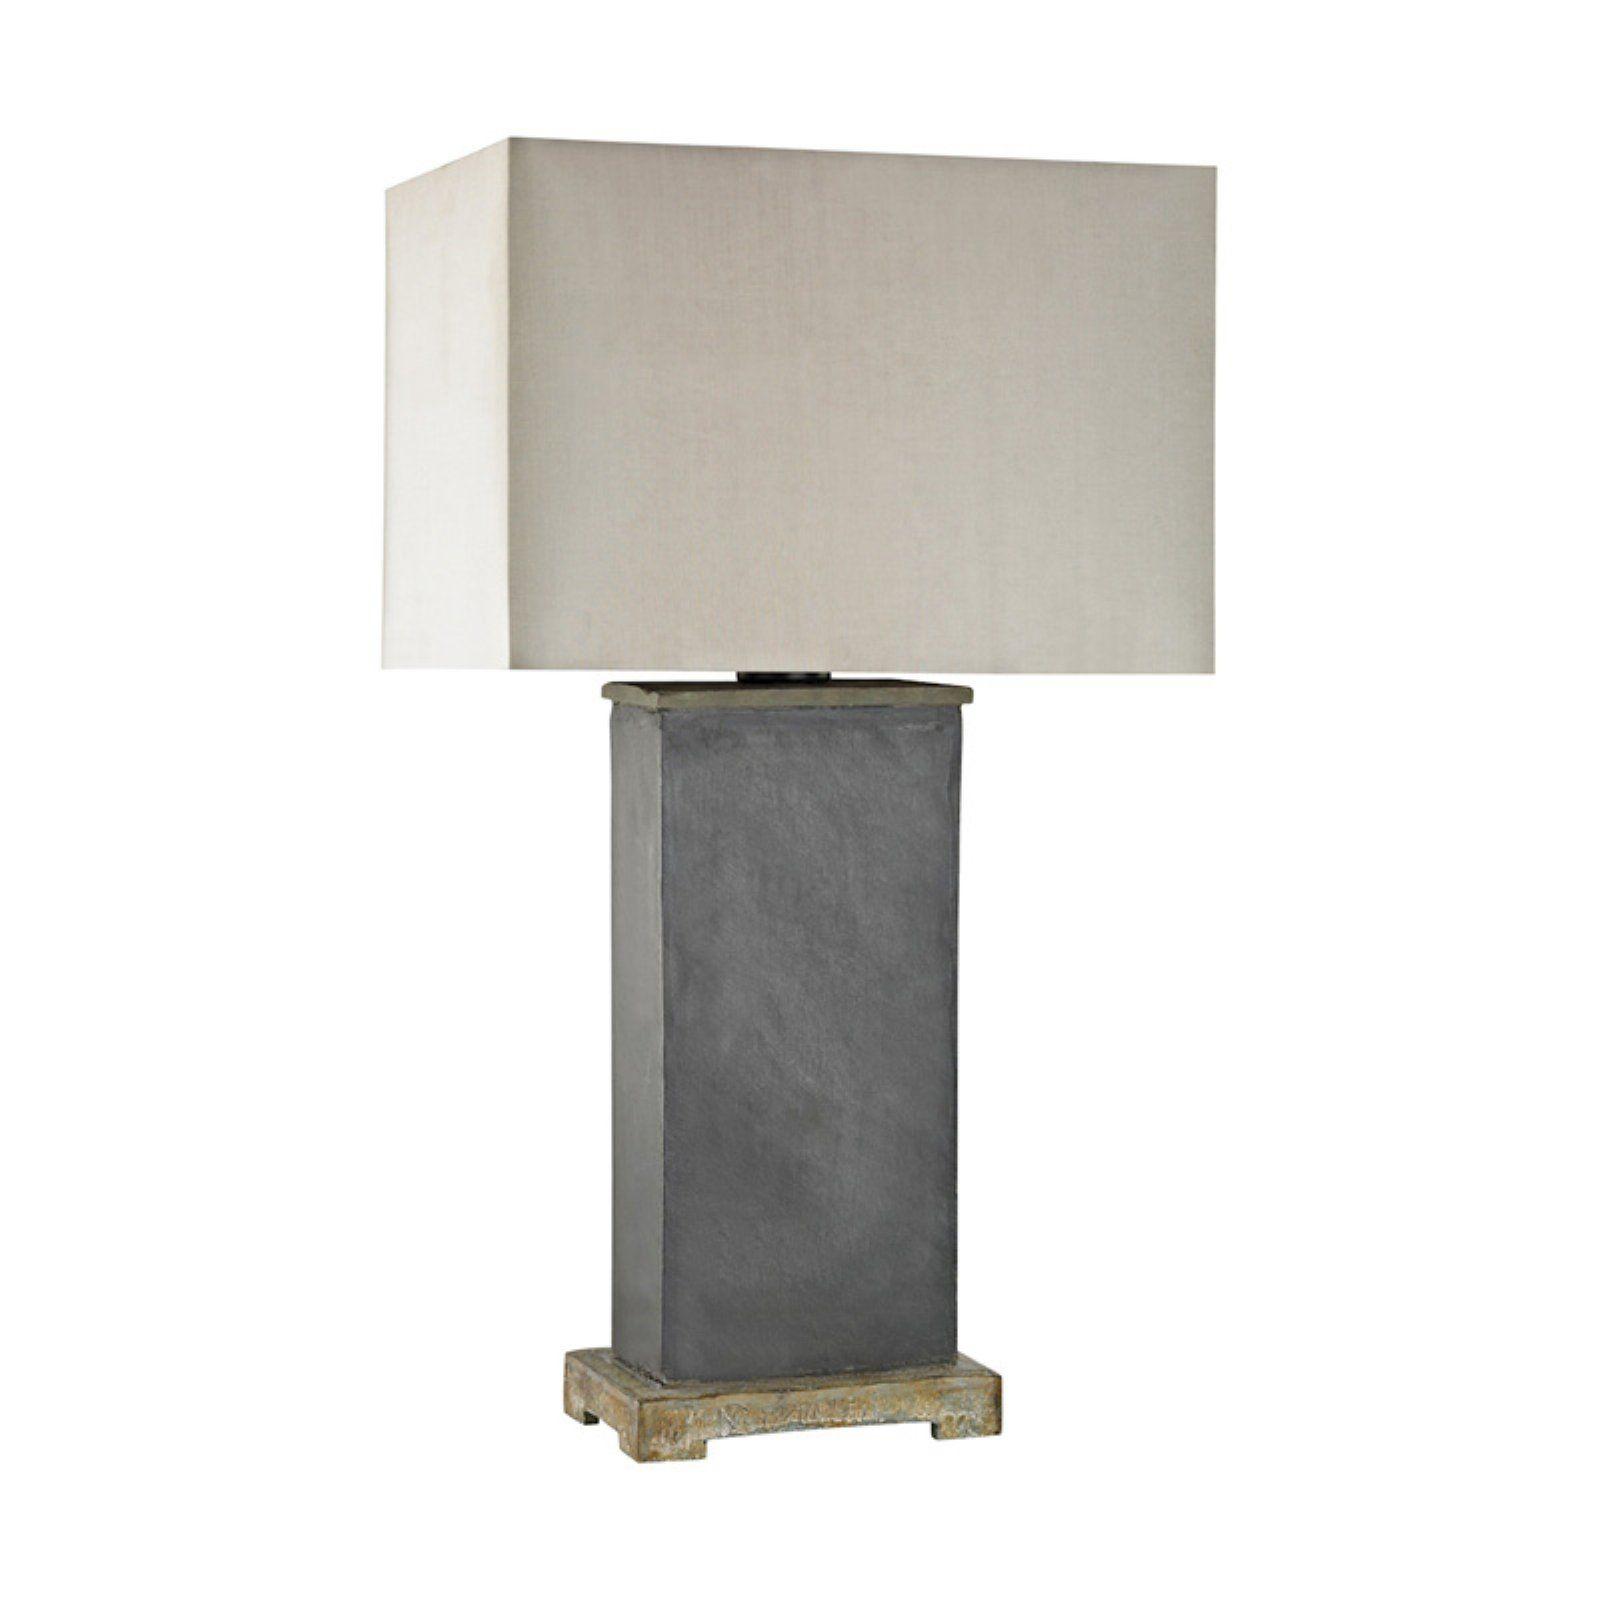 Dimond Lighting Elliot Bay Outdoor Led Table Lamp Grey Table